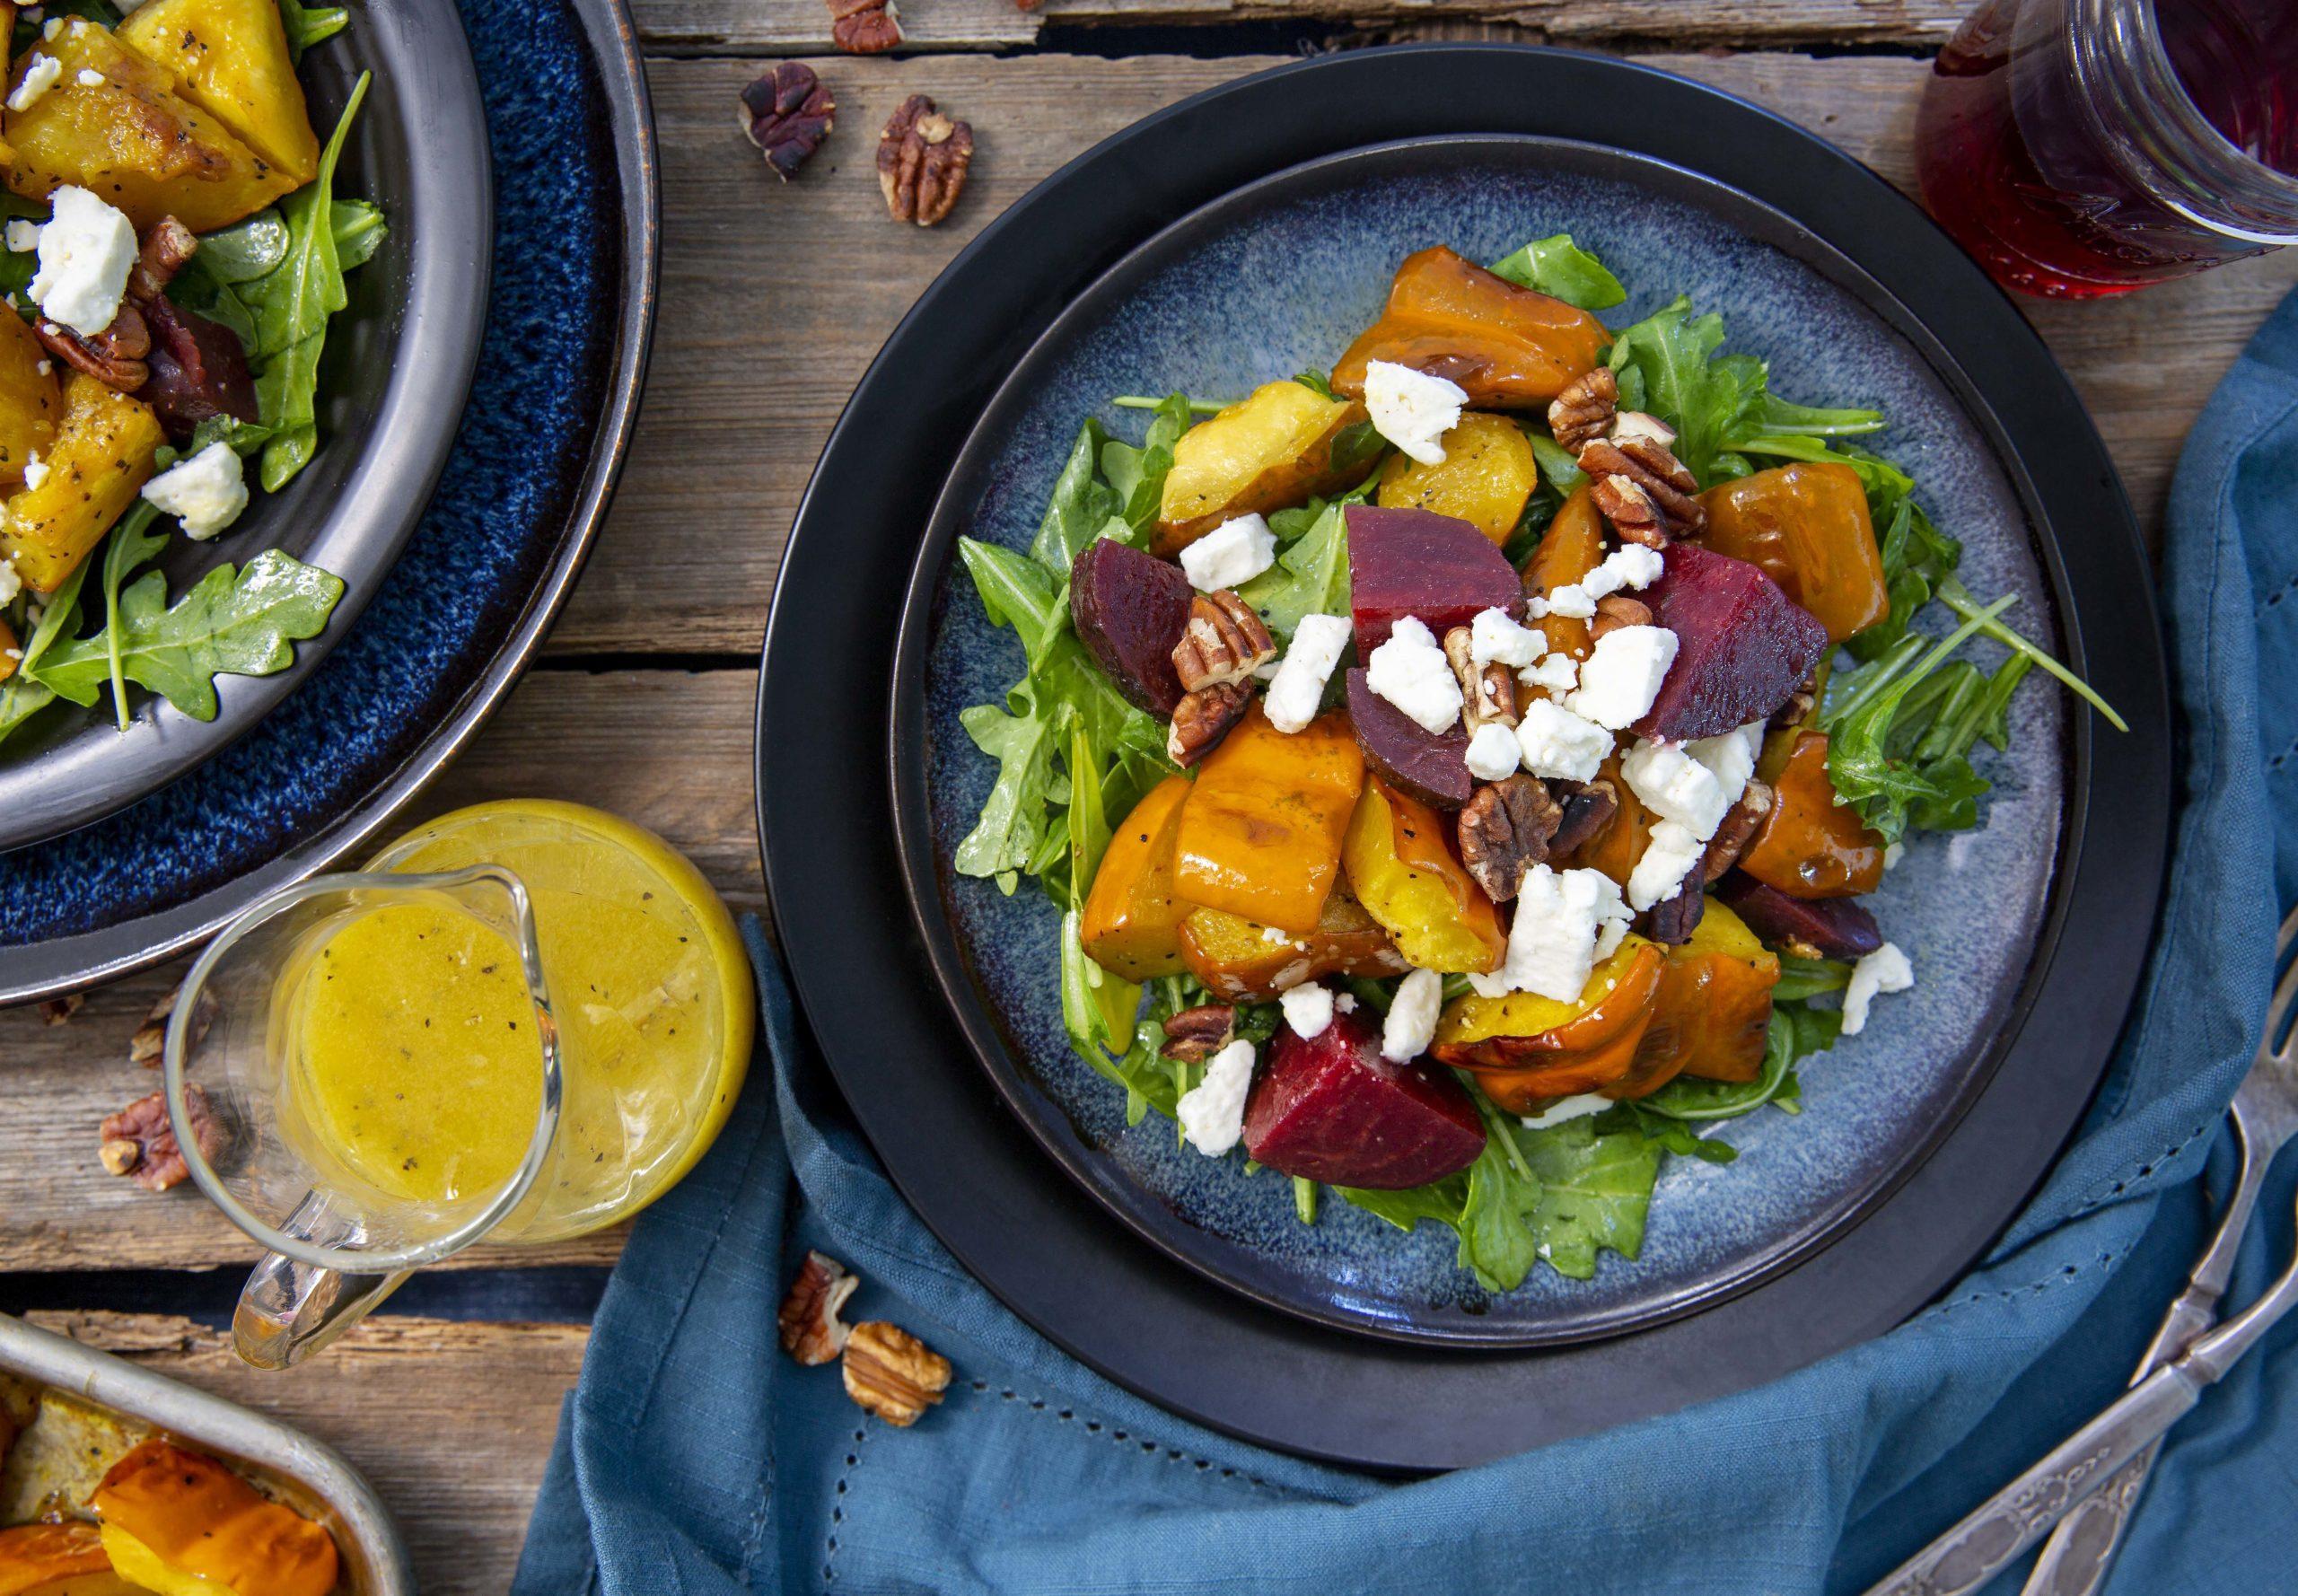 Marukan Roasted Acorn Squash Salad